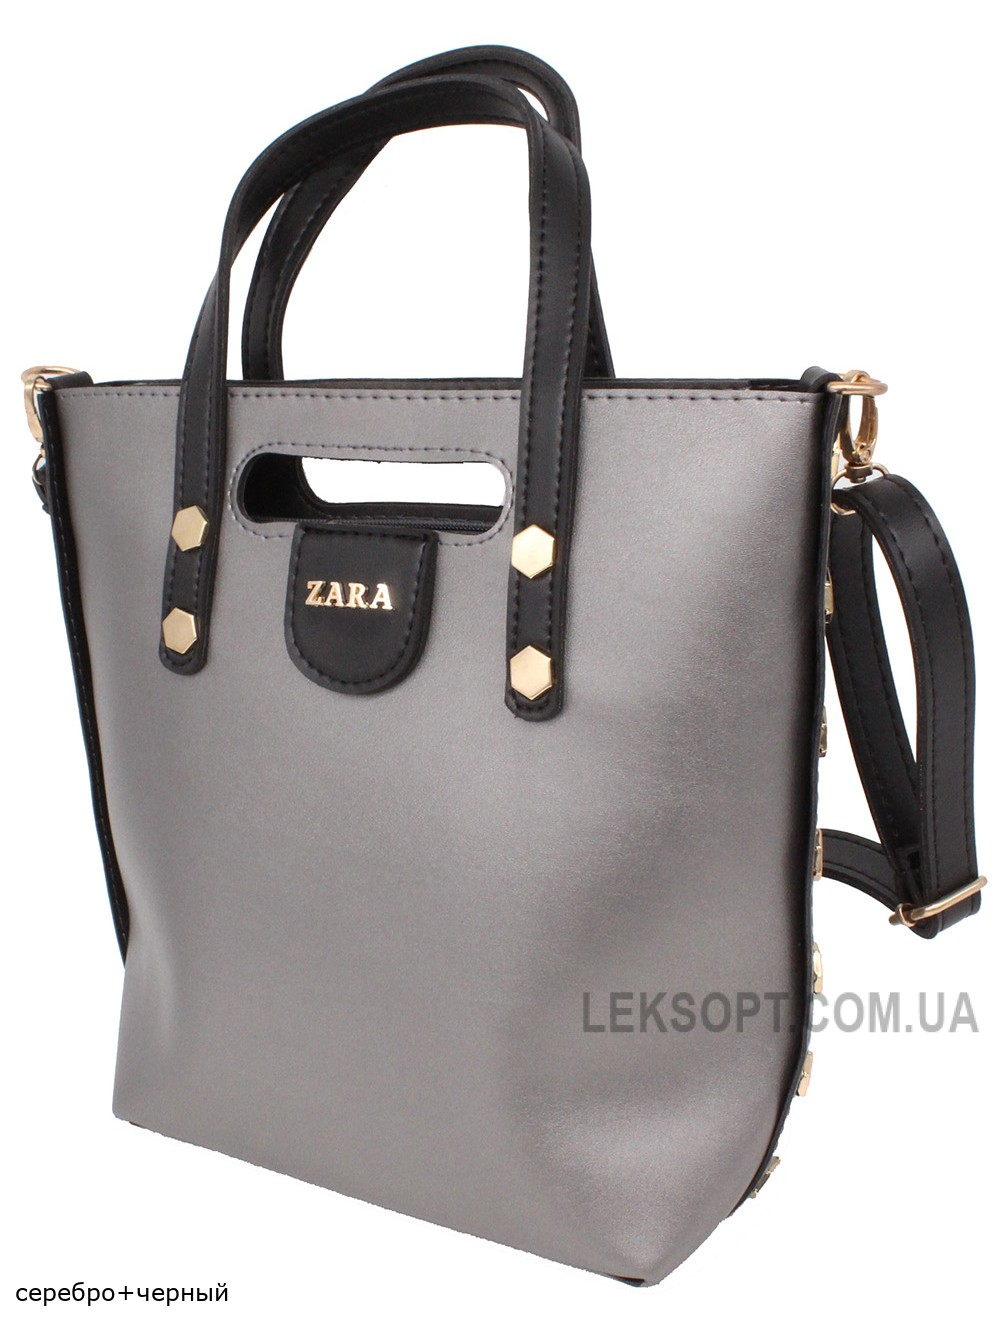 Женская модельная сумка Zara кожзам 29х25х11 - Za106-107